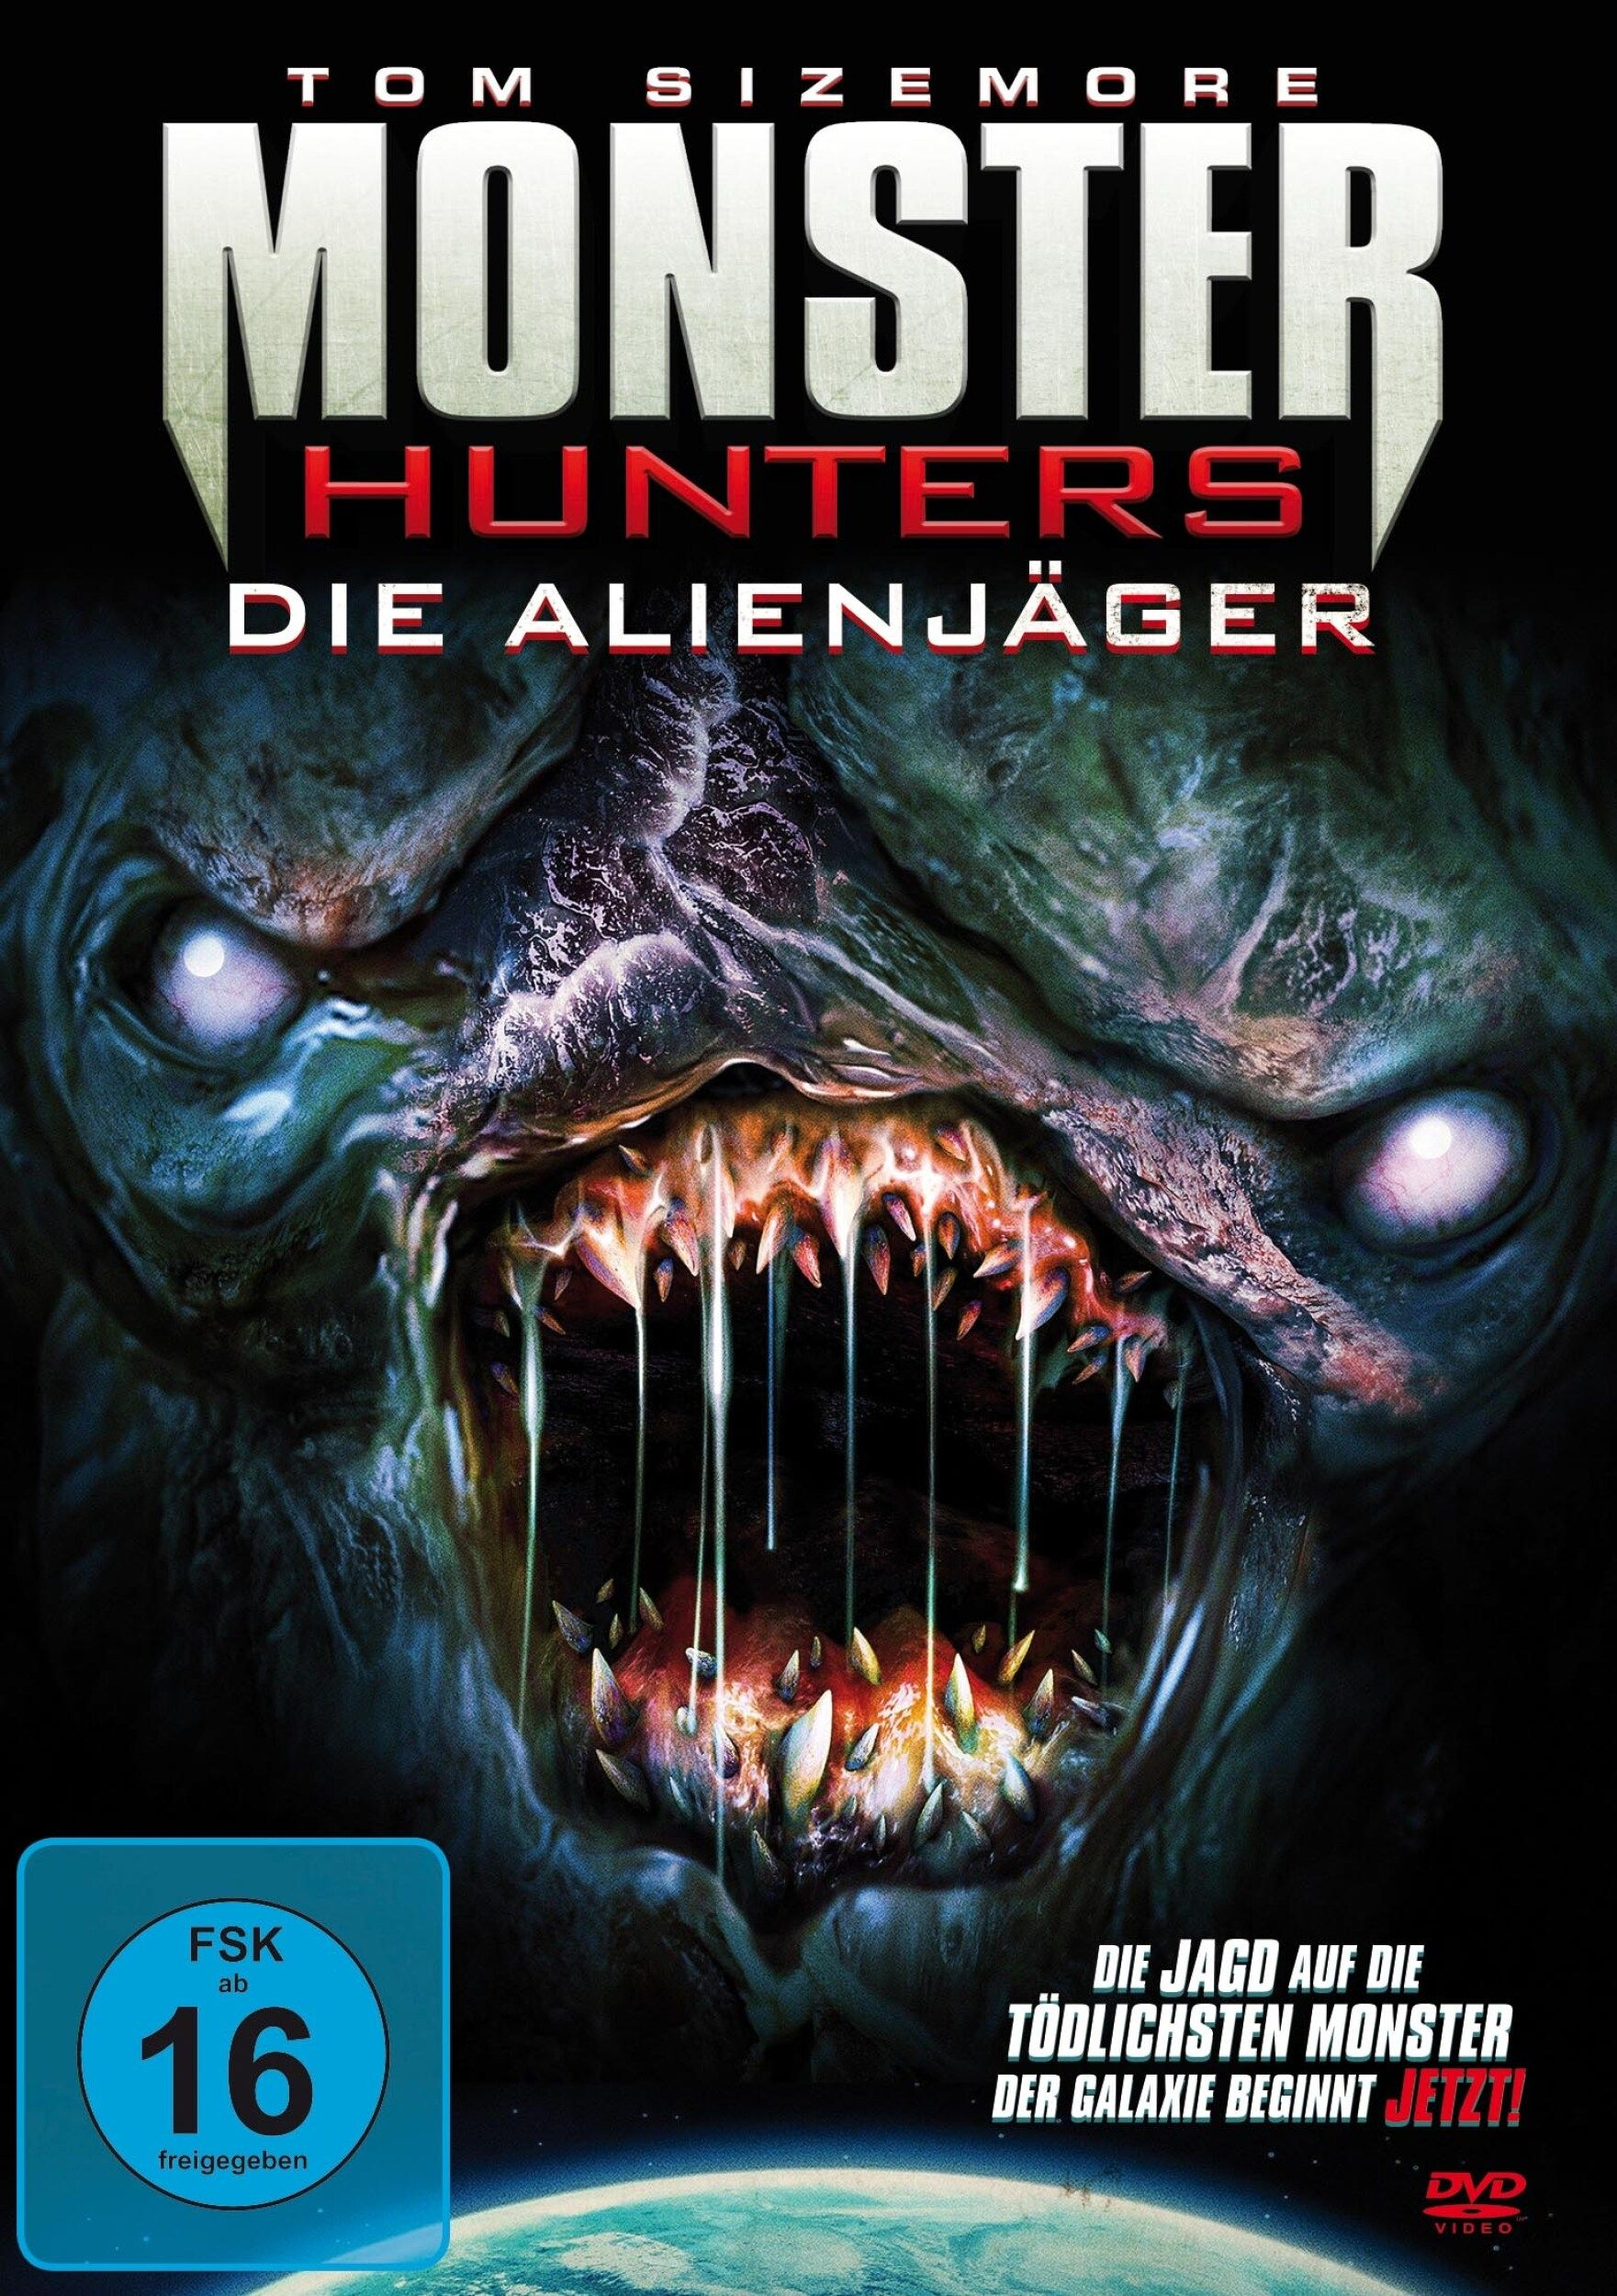 Monster Hunters - Die Alienjäger (BLURAY)